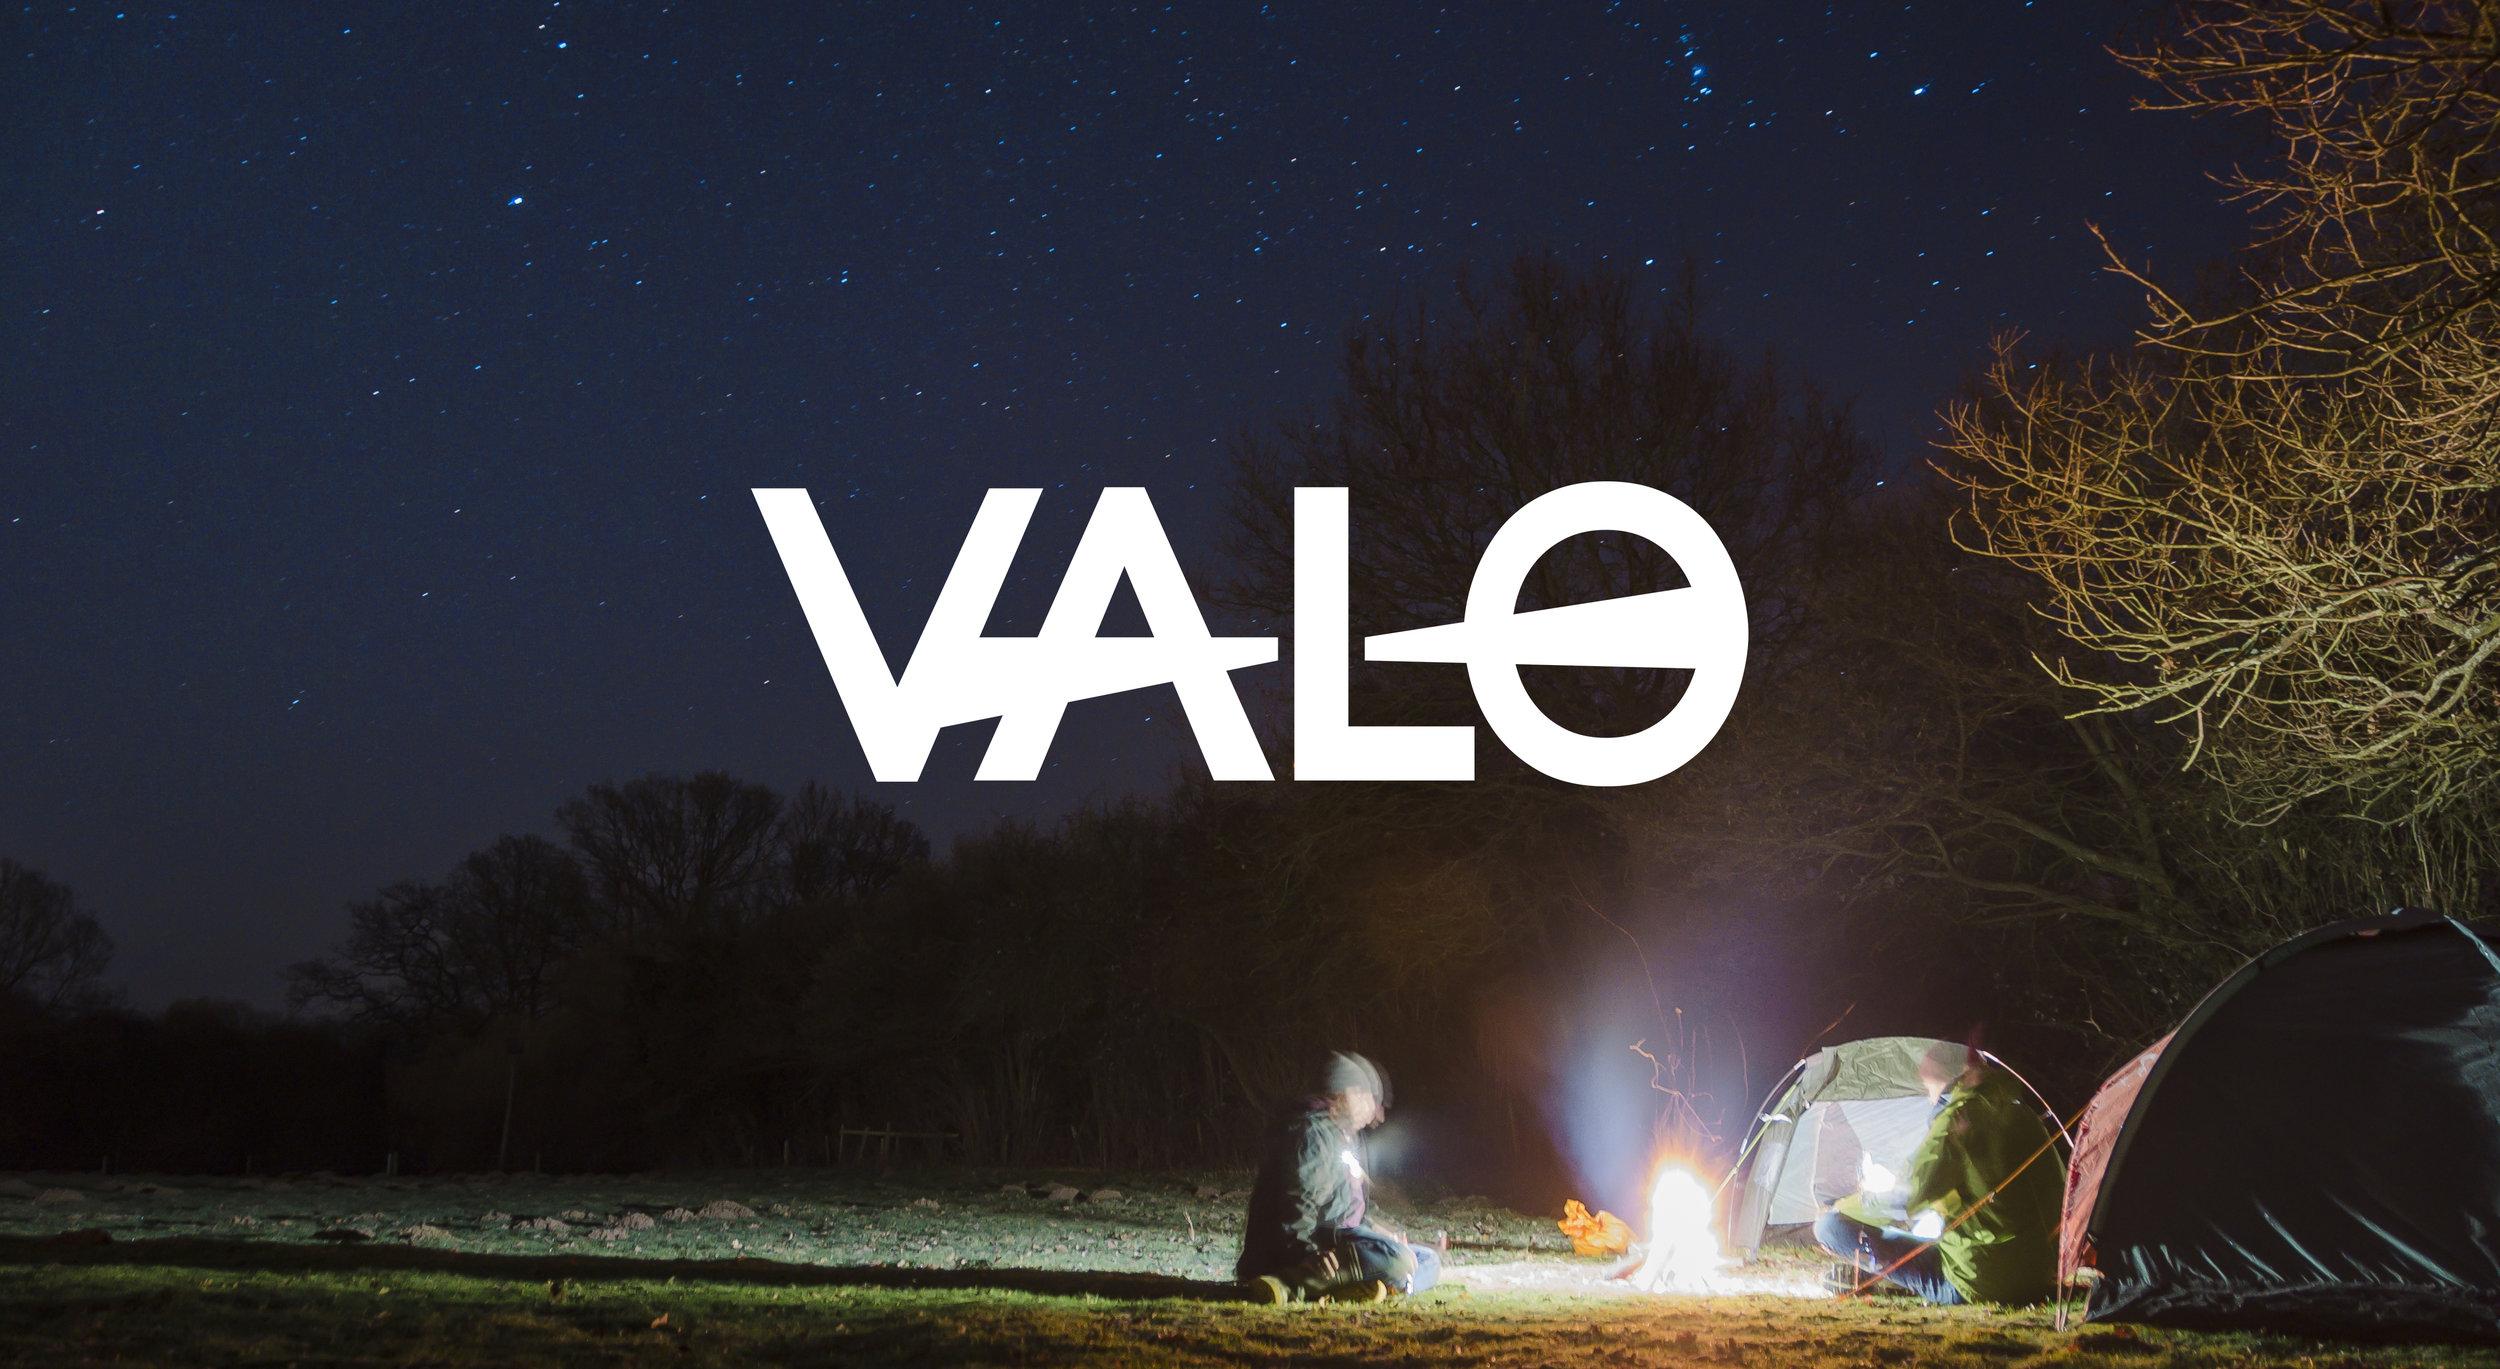 Valo_Camping Long Exposure_01.jpg